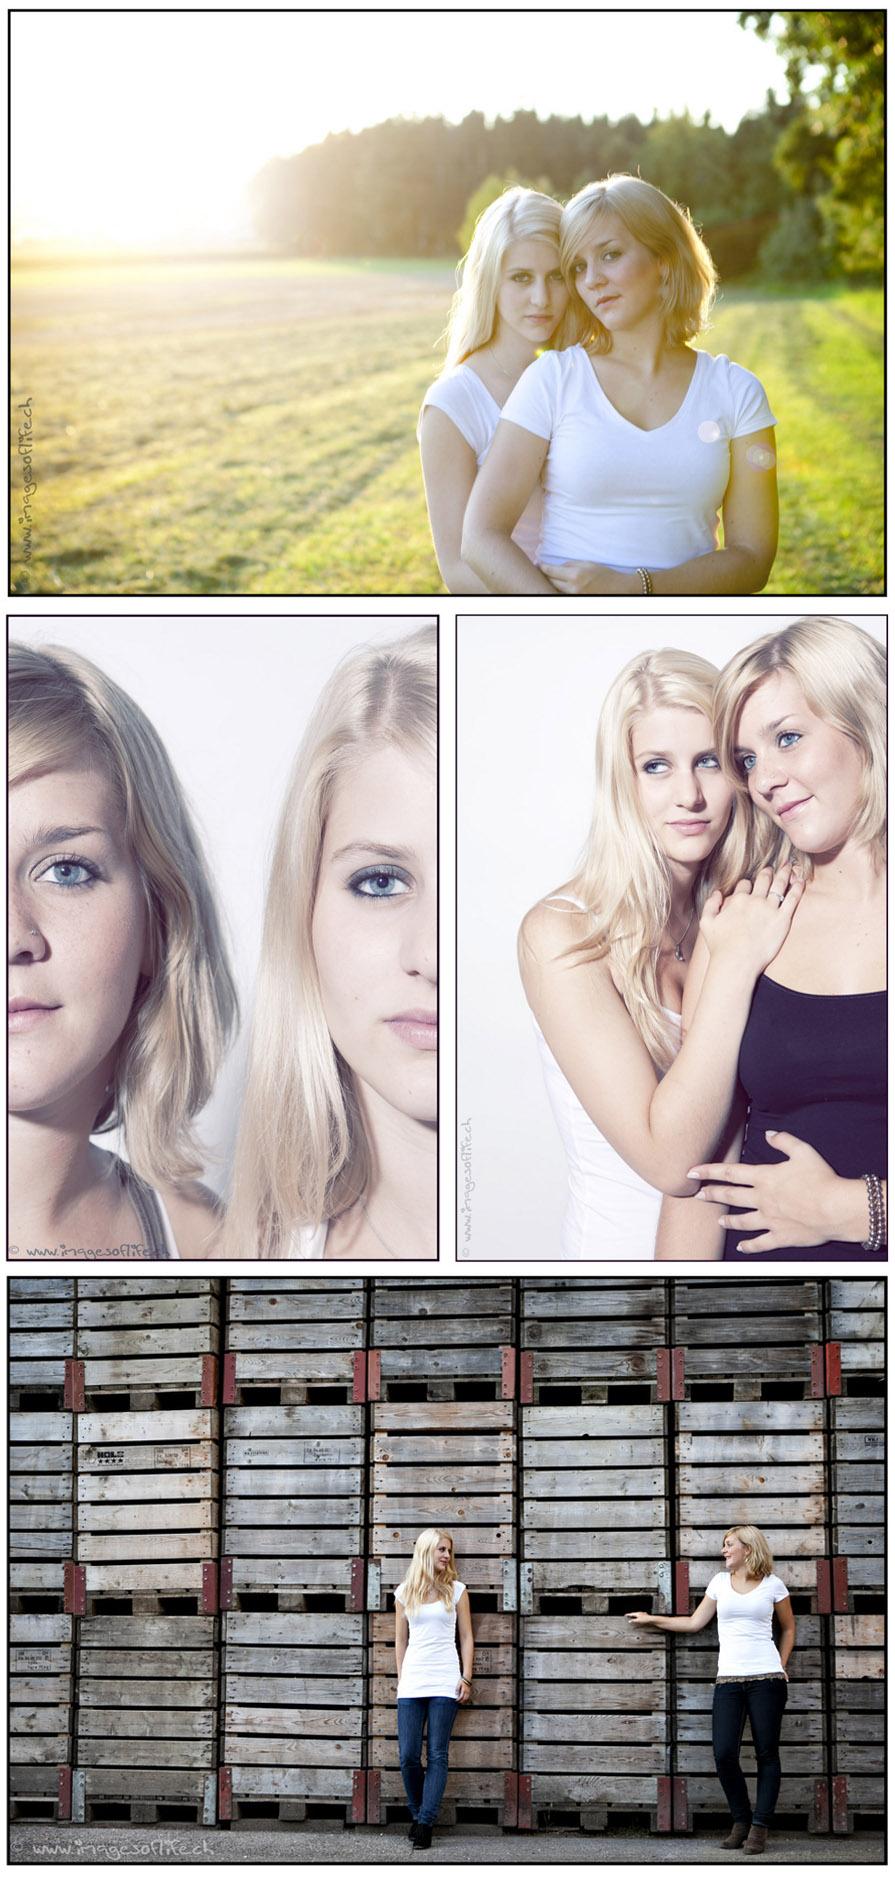 sister-actjpg